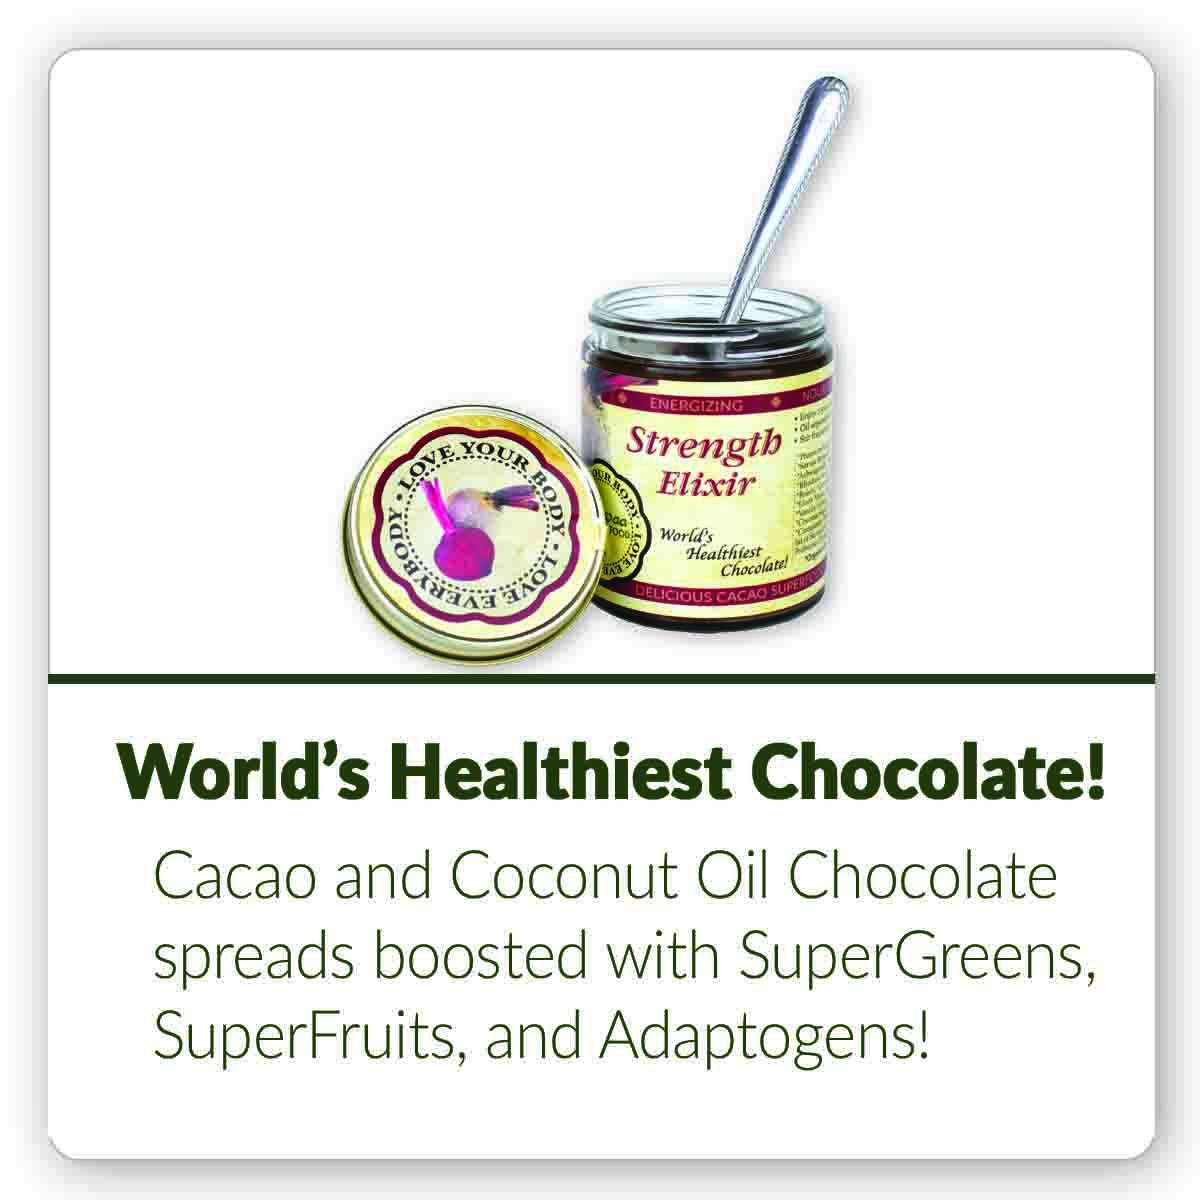 worldshealthiestchocolateelixirbutton.jpg